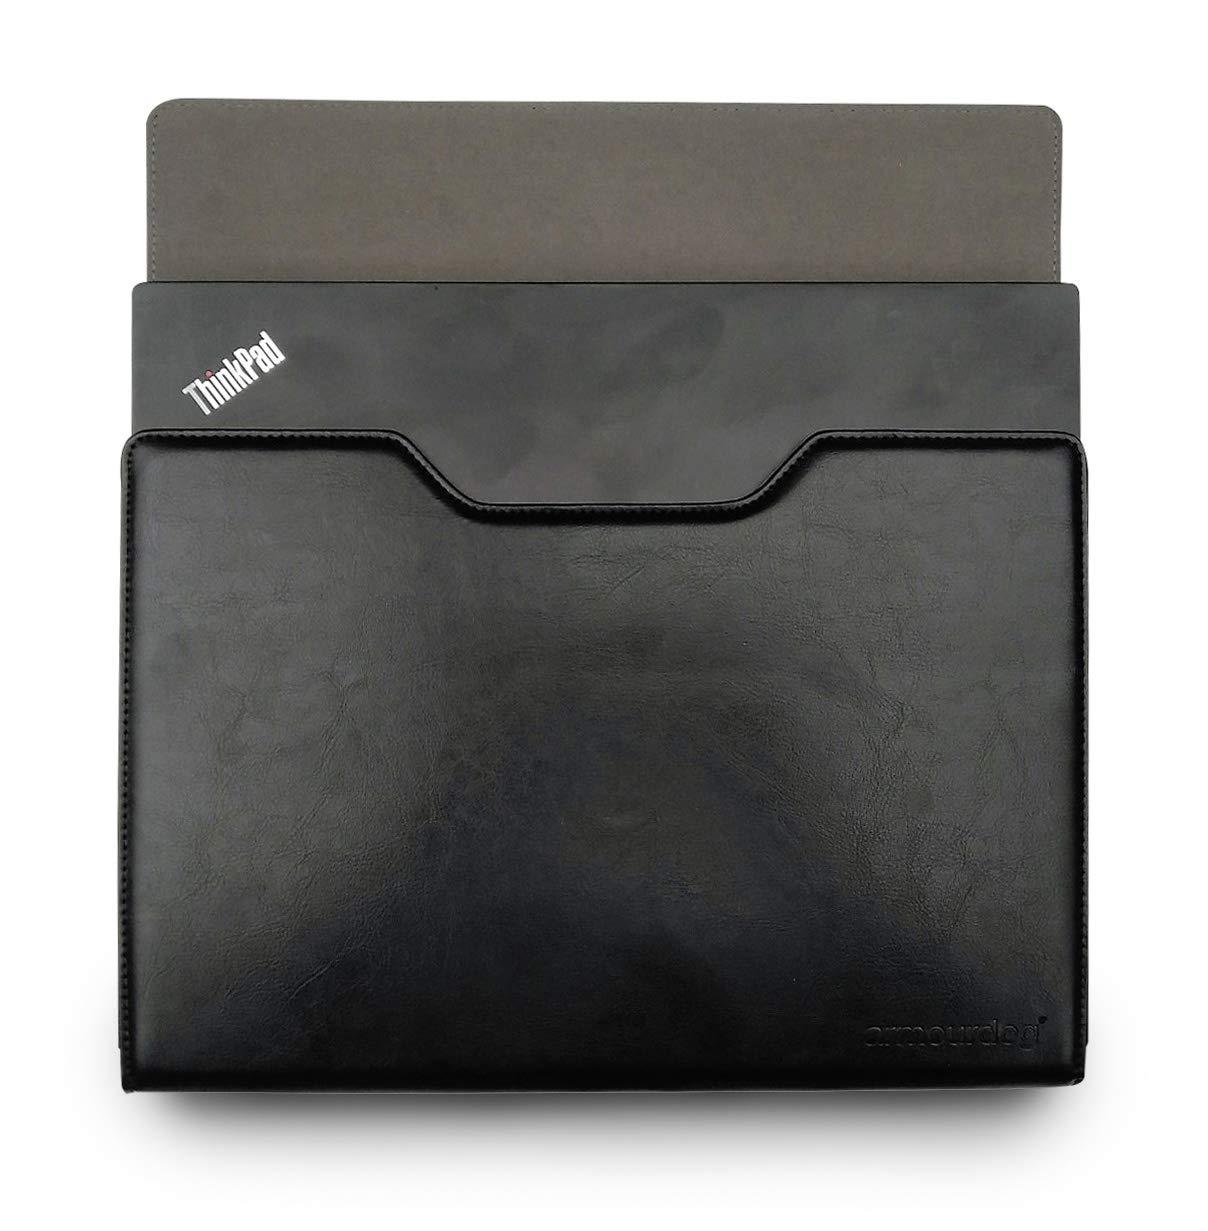 armourdog - Funda para Tablet Lenovo Thinkpad X1, X1 Carbon, T470s, T480s, Yoga 260/370/X380, L380 y X280: Amazon.es: Electrónica